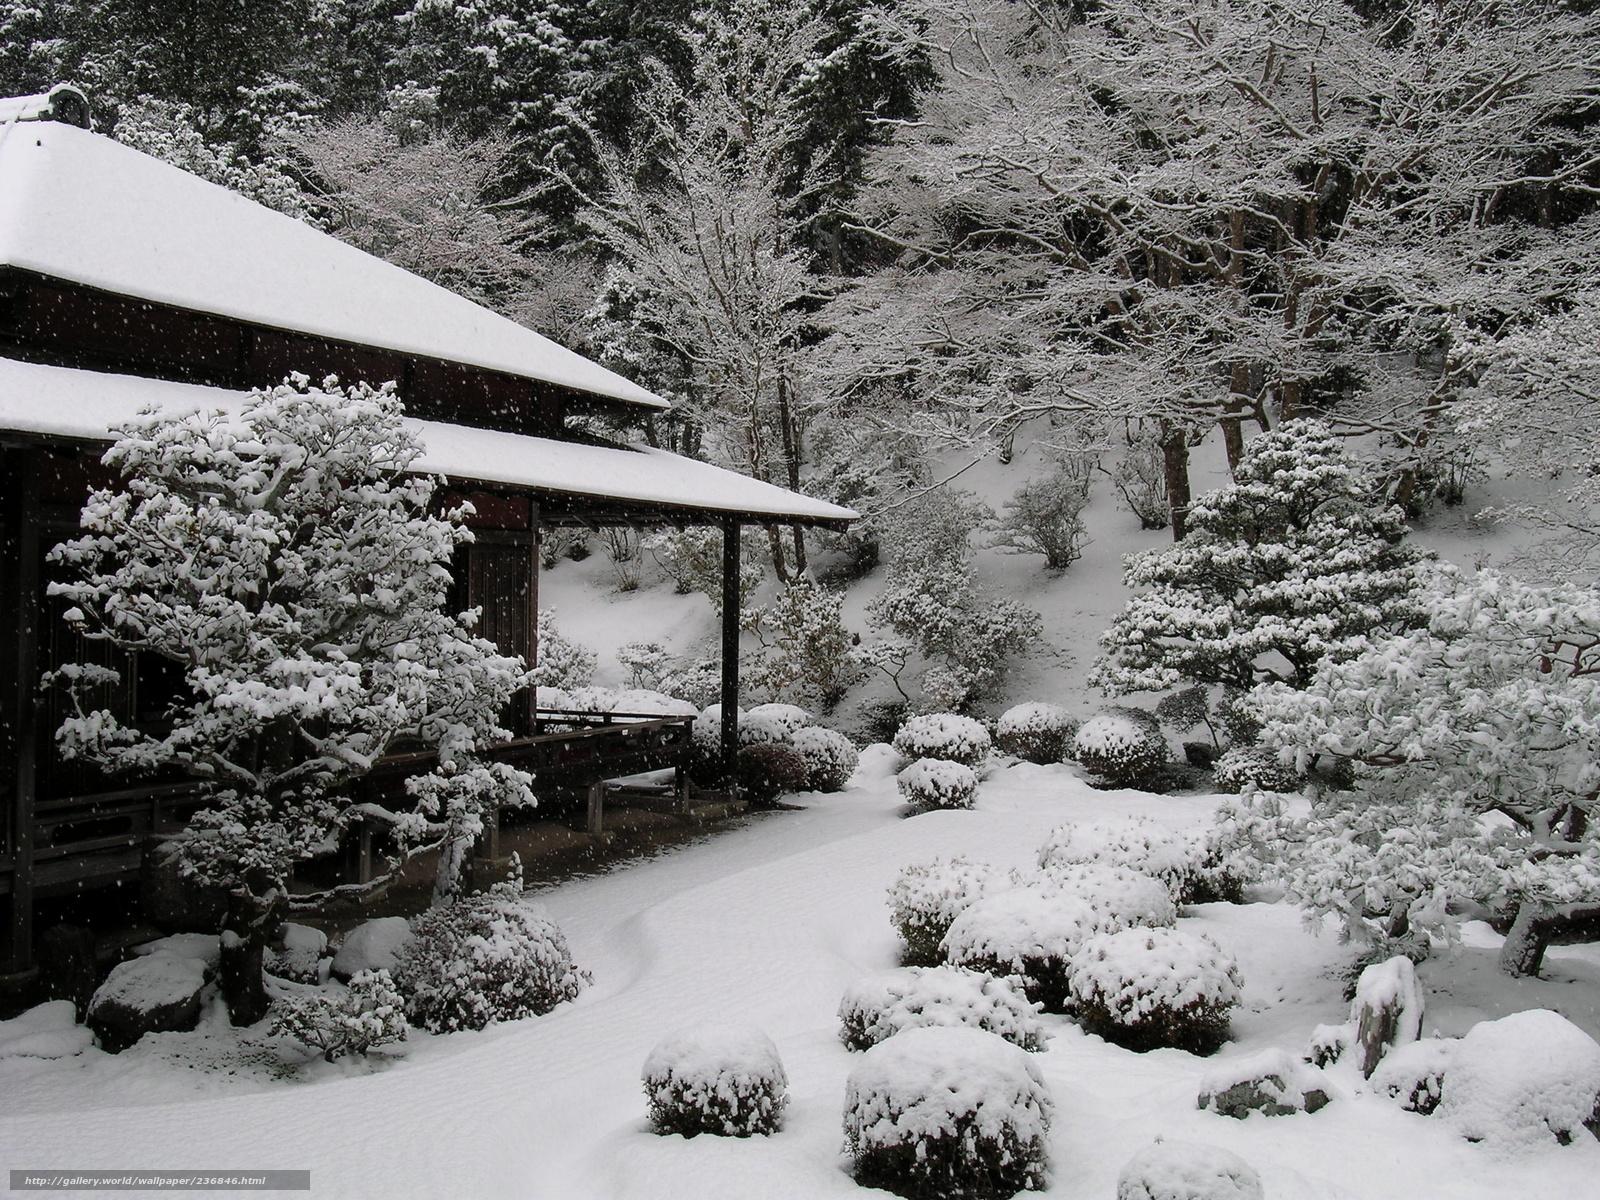 дерево предпочитает японский лес зимой фото поговорим том